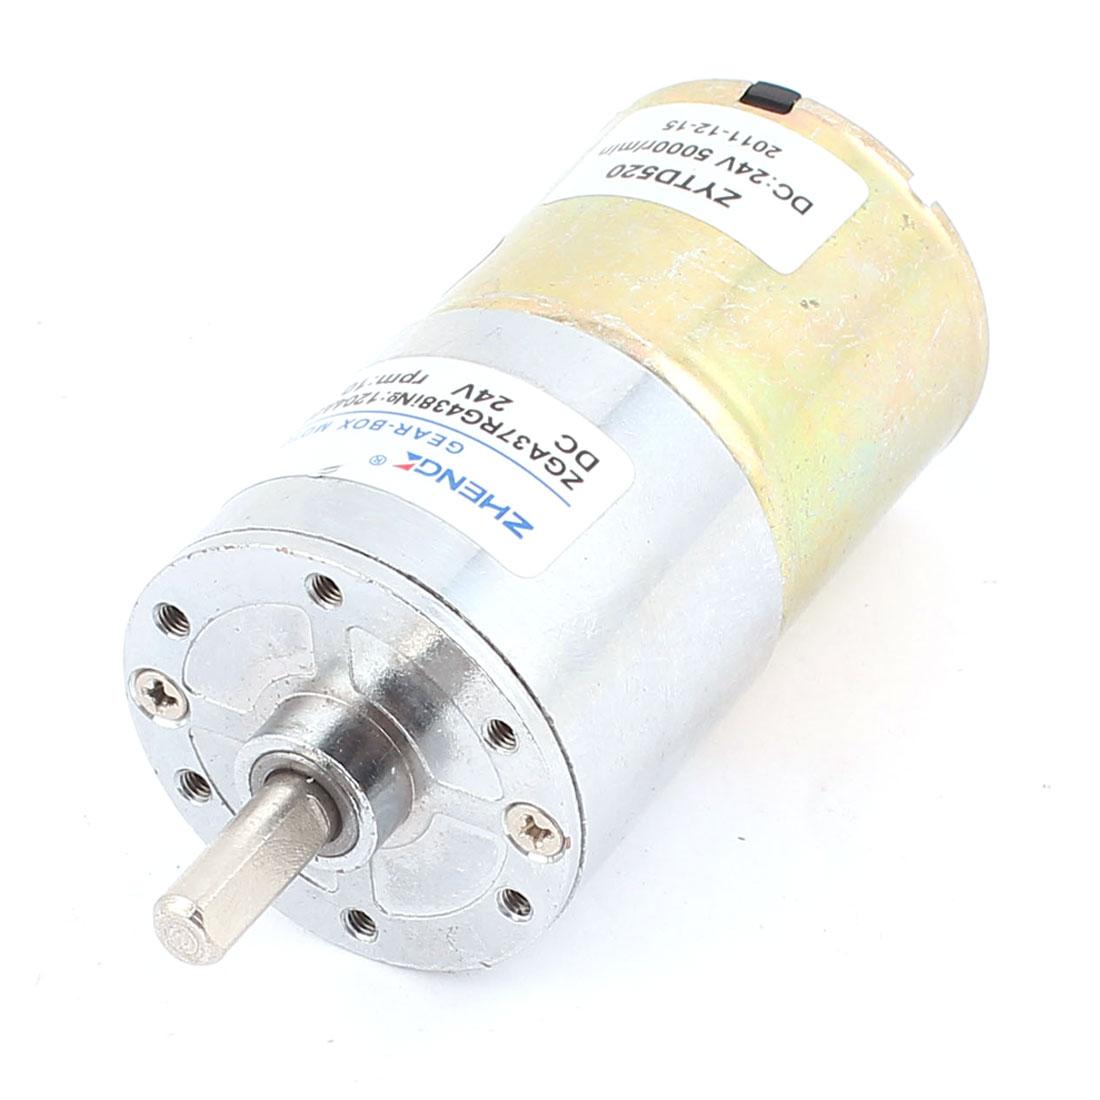 Metal DC 24V 10RPM Output Speed Efficient Gear-Box Motor